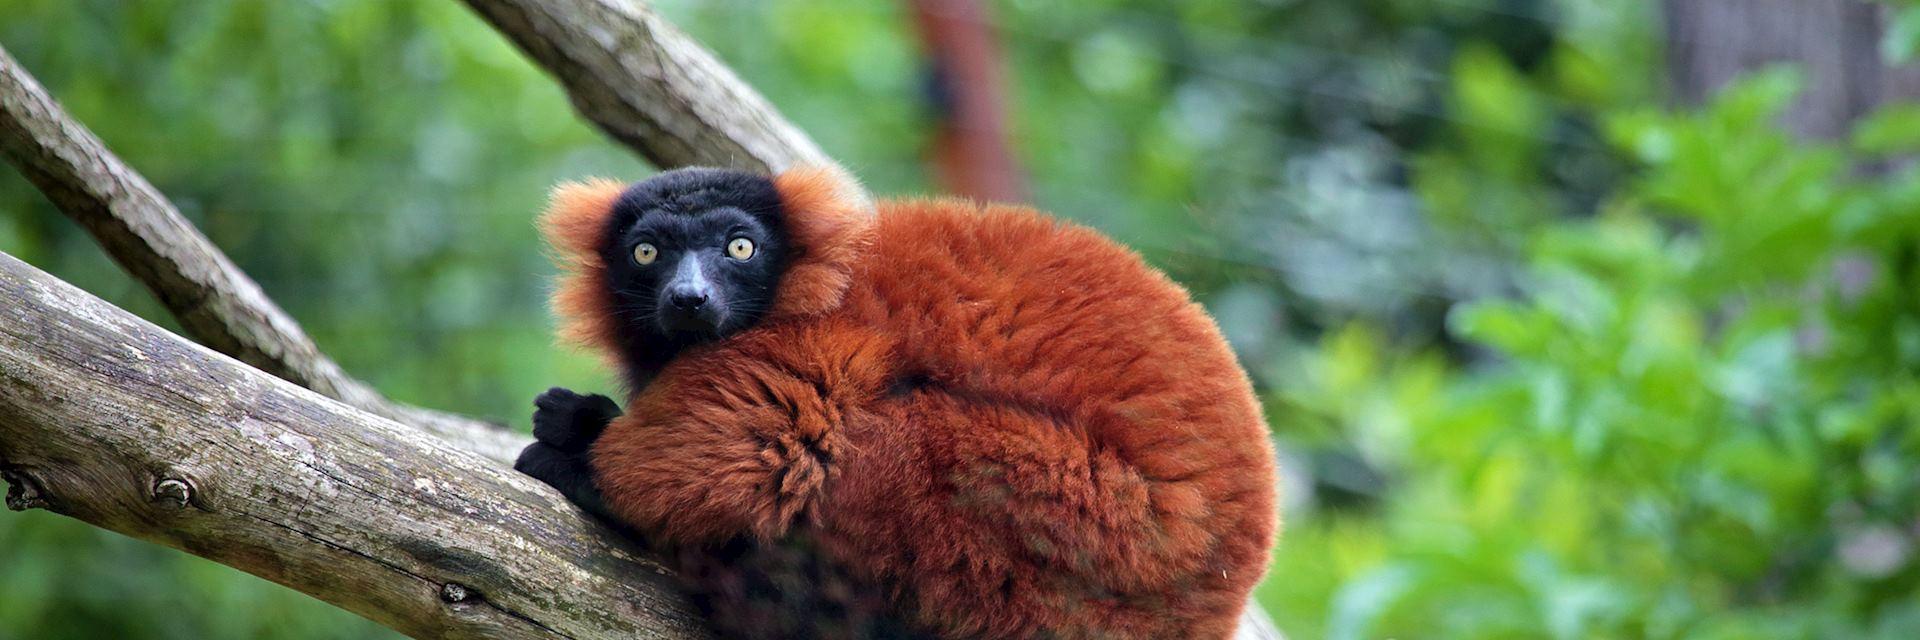 Red ruffed lemur, Madagascar